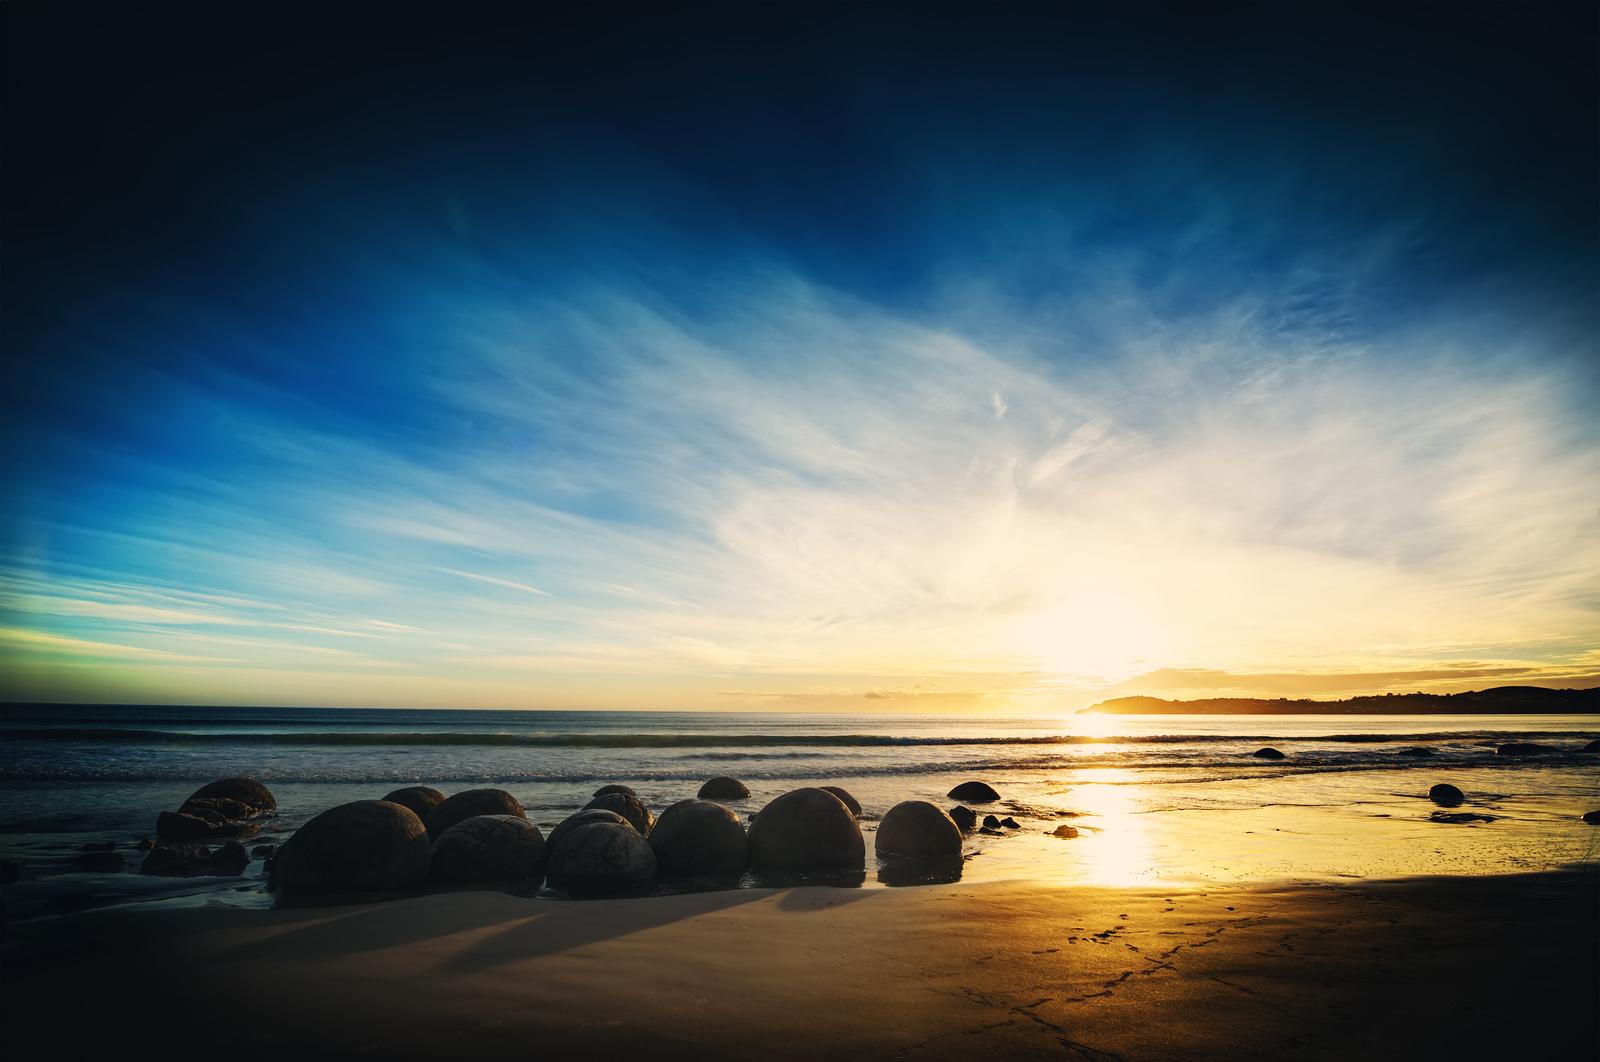 The Coastal Boulders